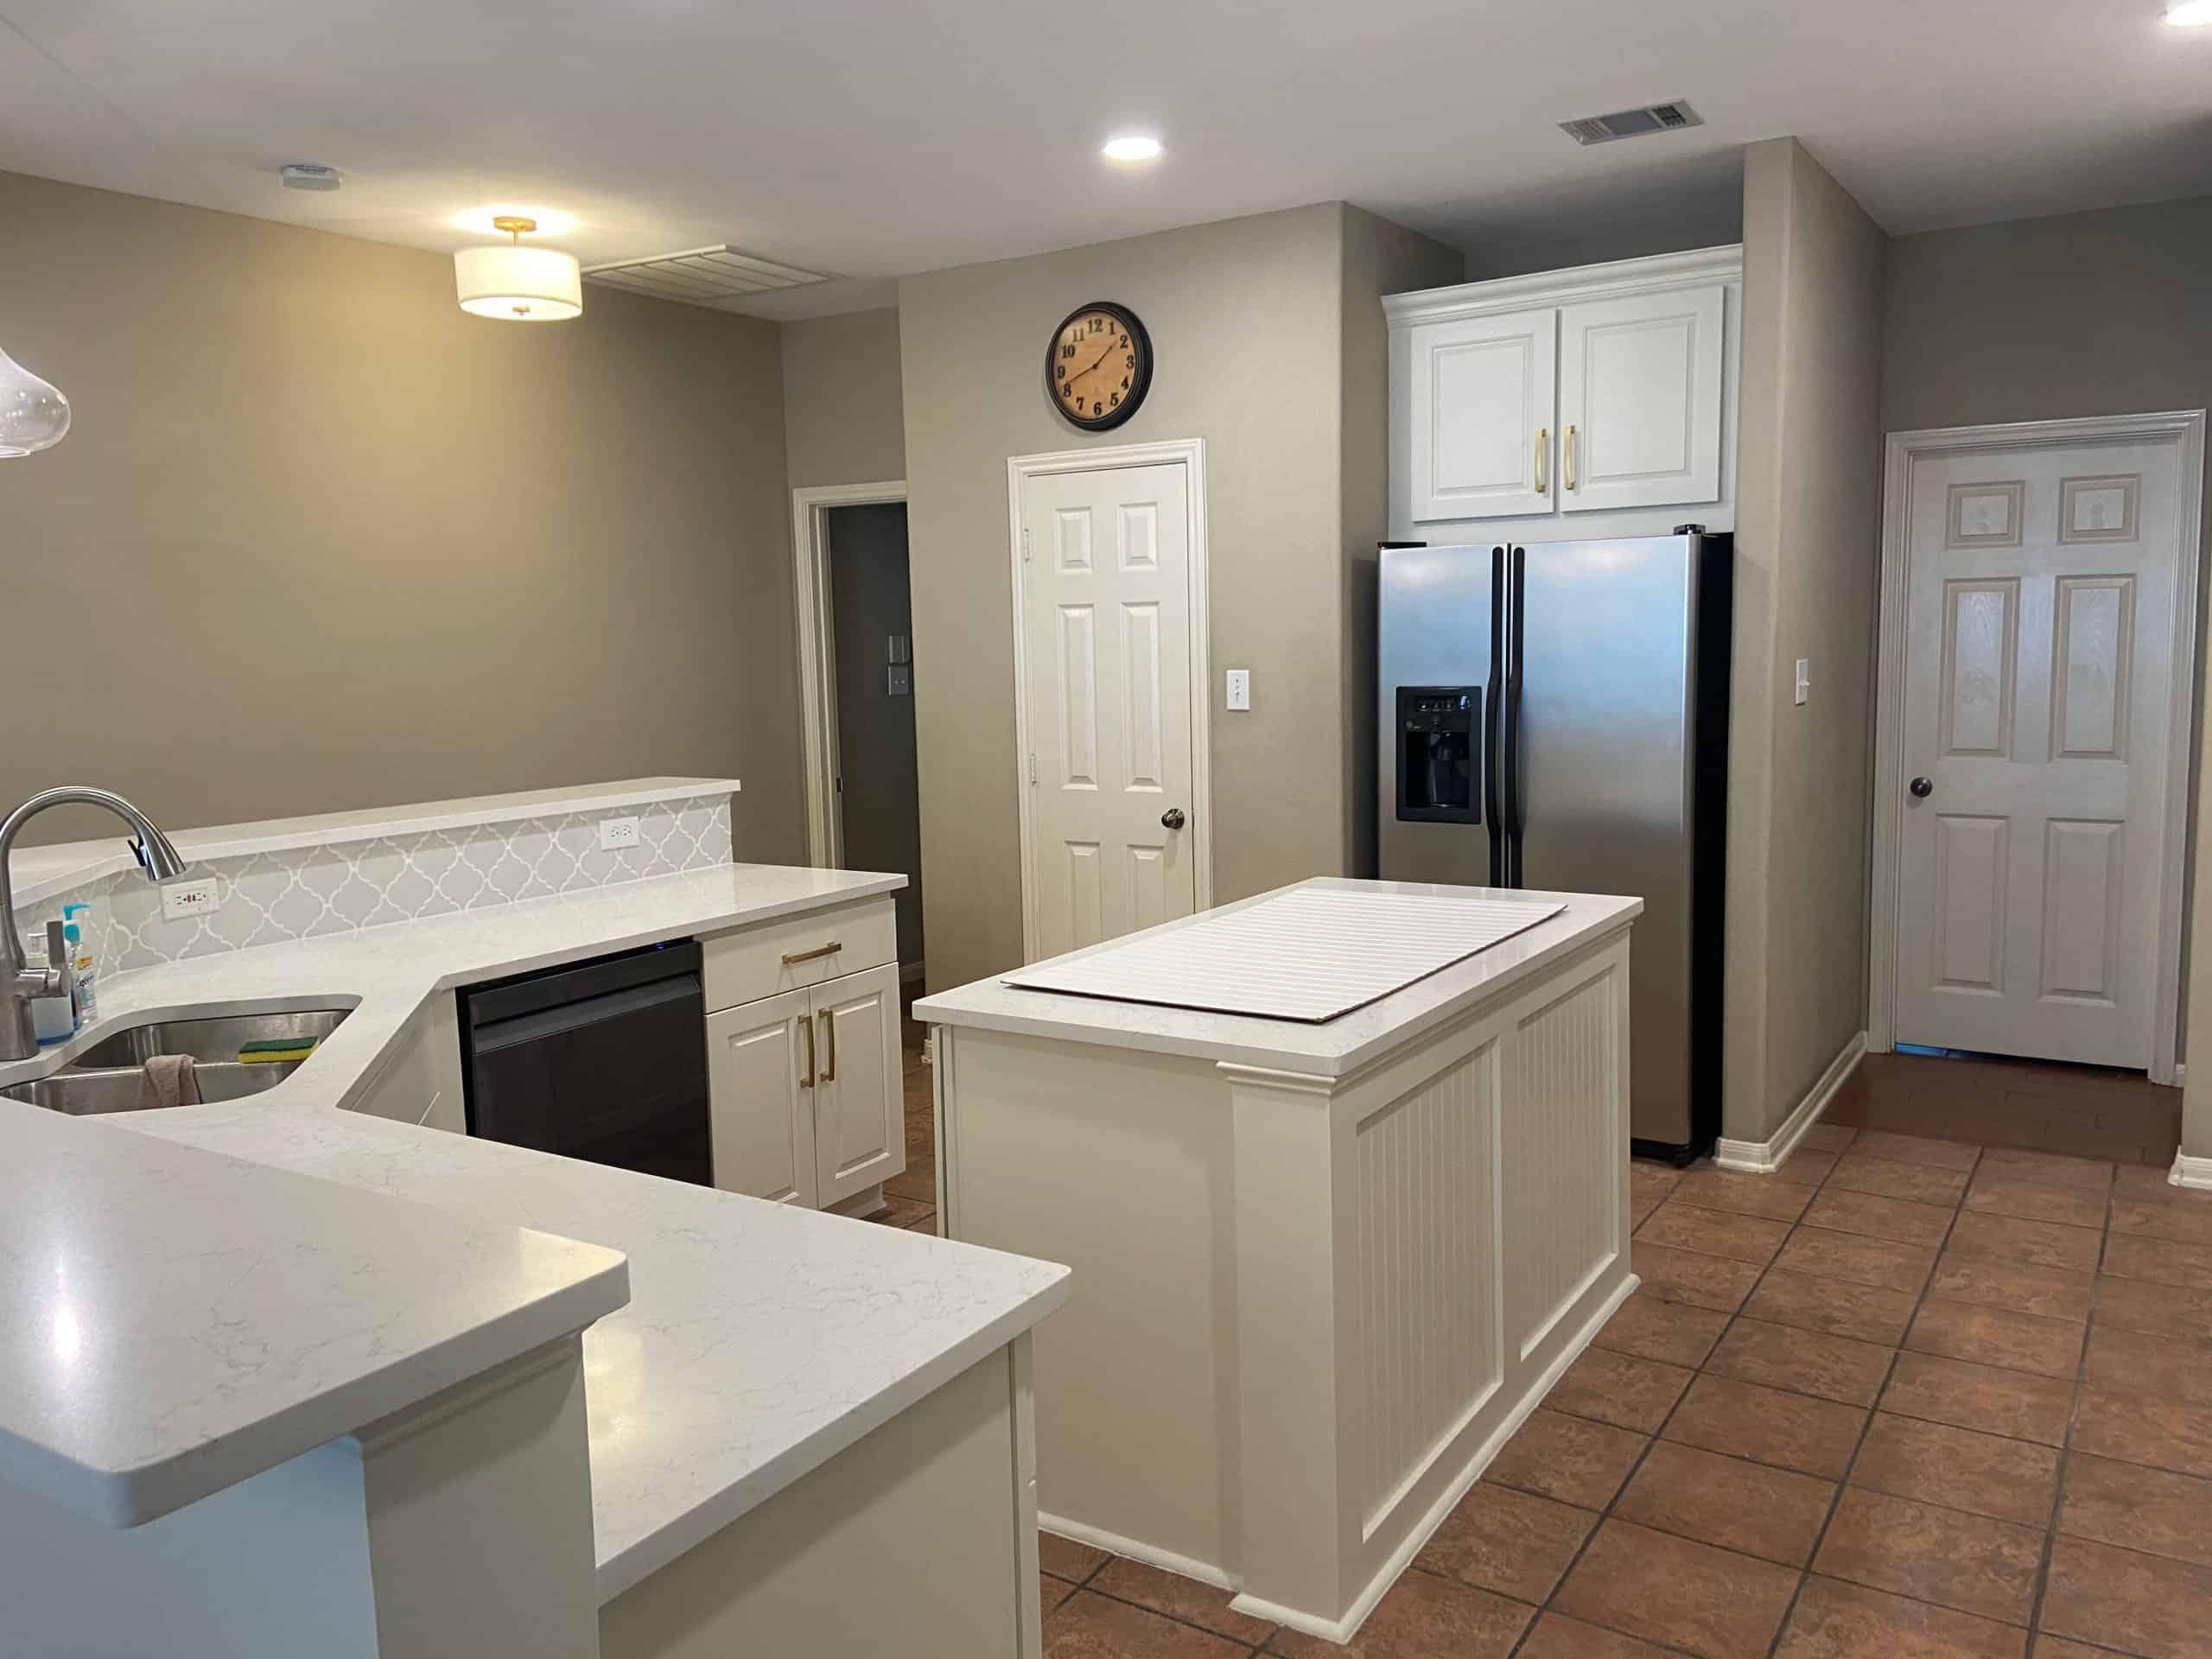 Kitchen And Bathroom Remodeling San Antonio C S Remodeling